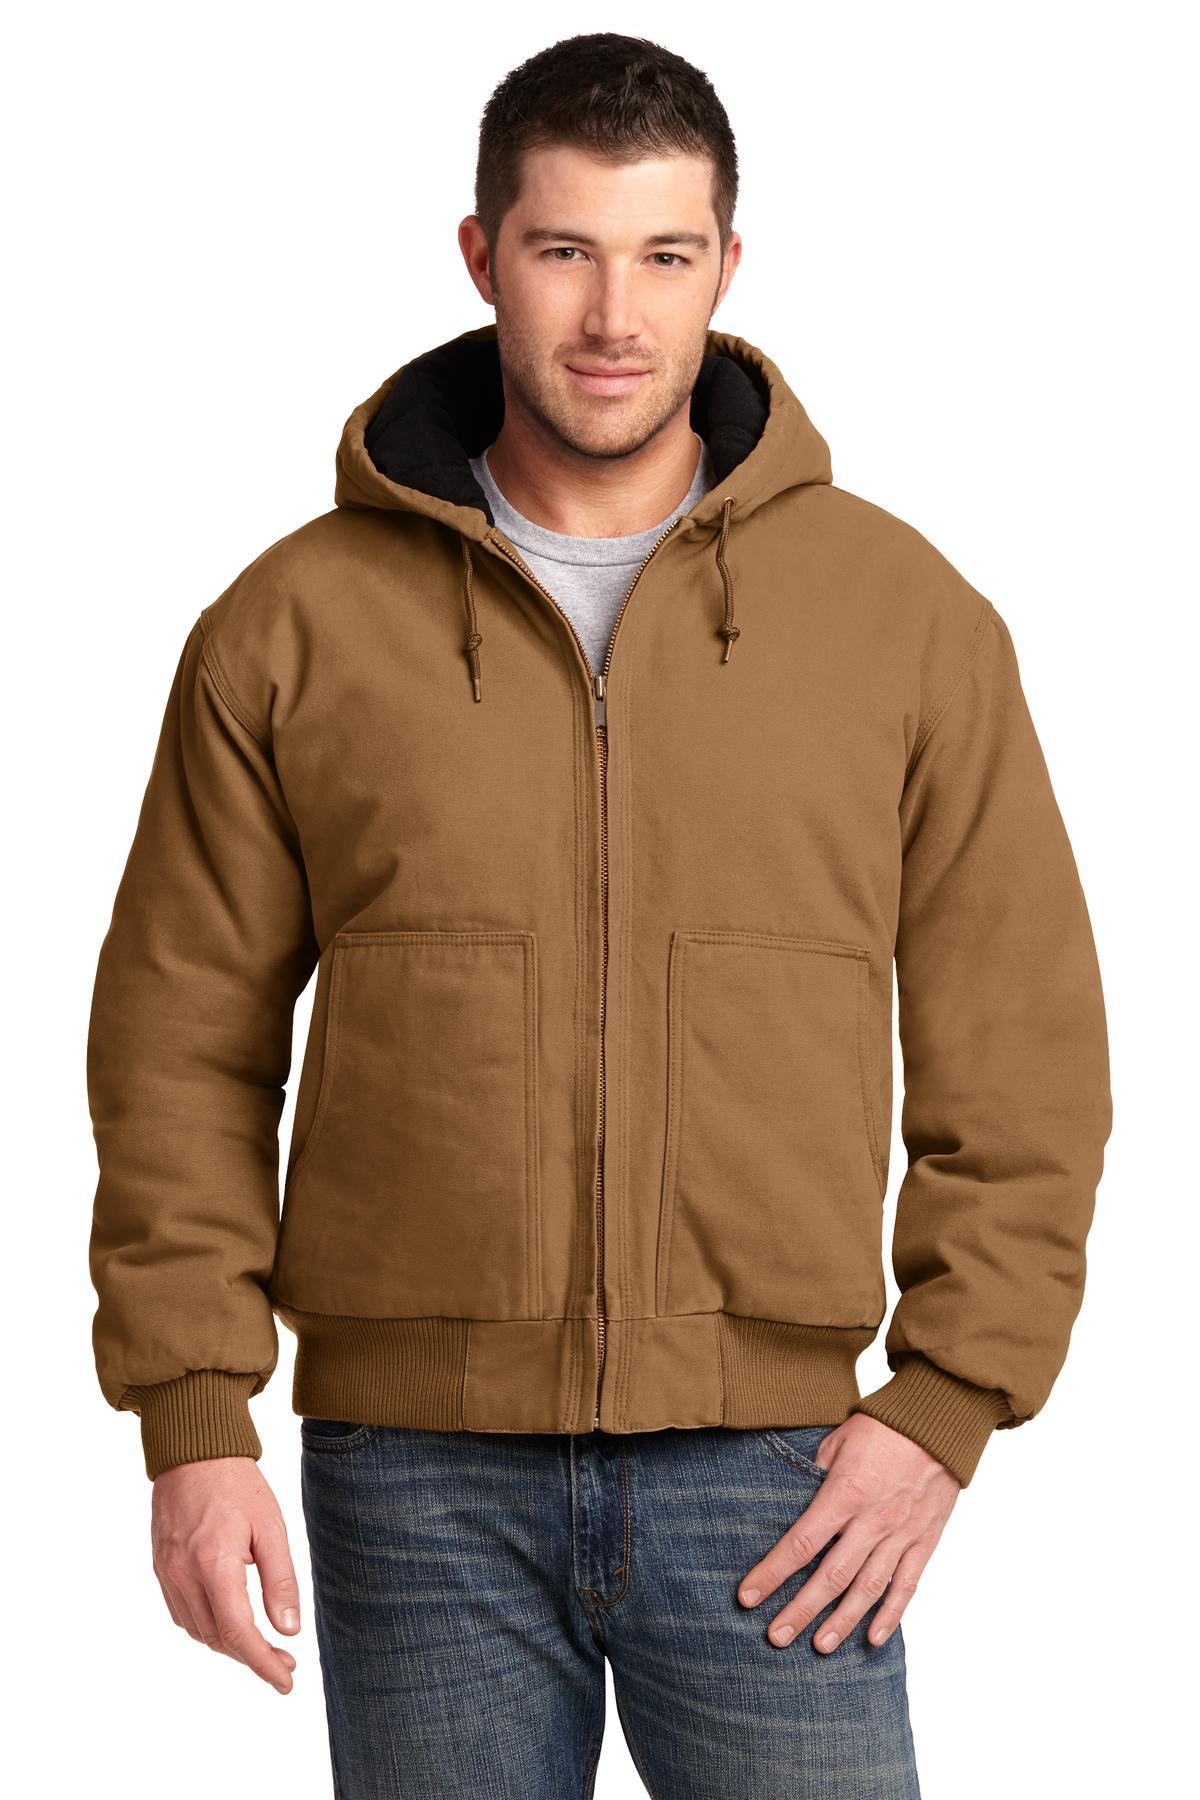 CornerStone® Washed Duck Cloth Insulated Hooded Work Jacket.-CornerStone